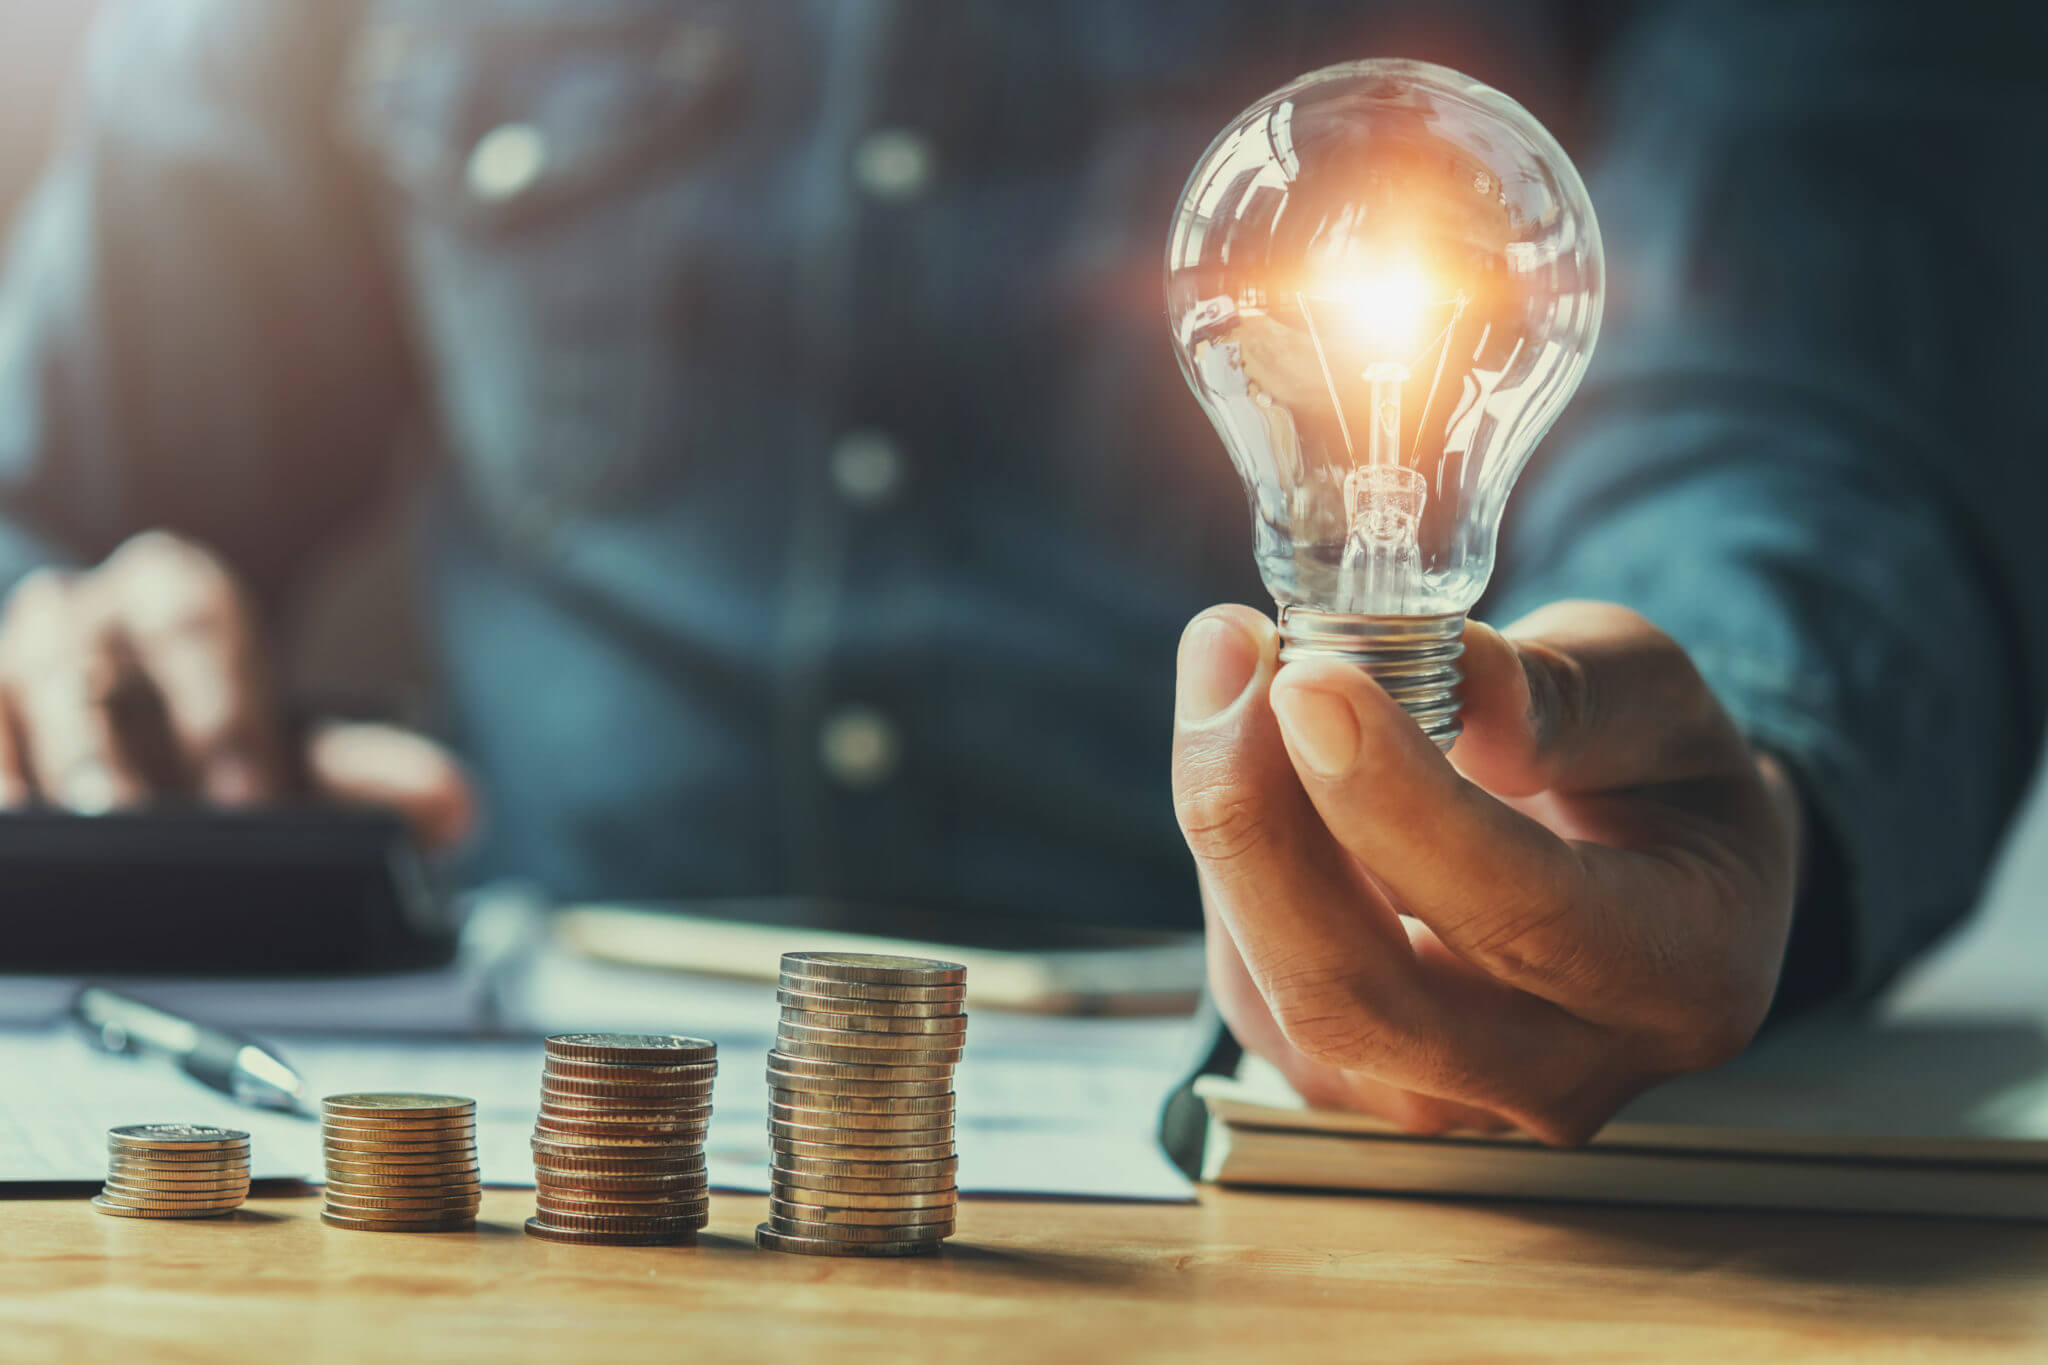 Save Money On Electric Bills